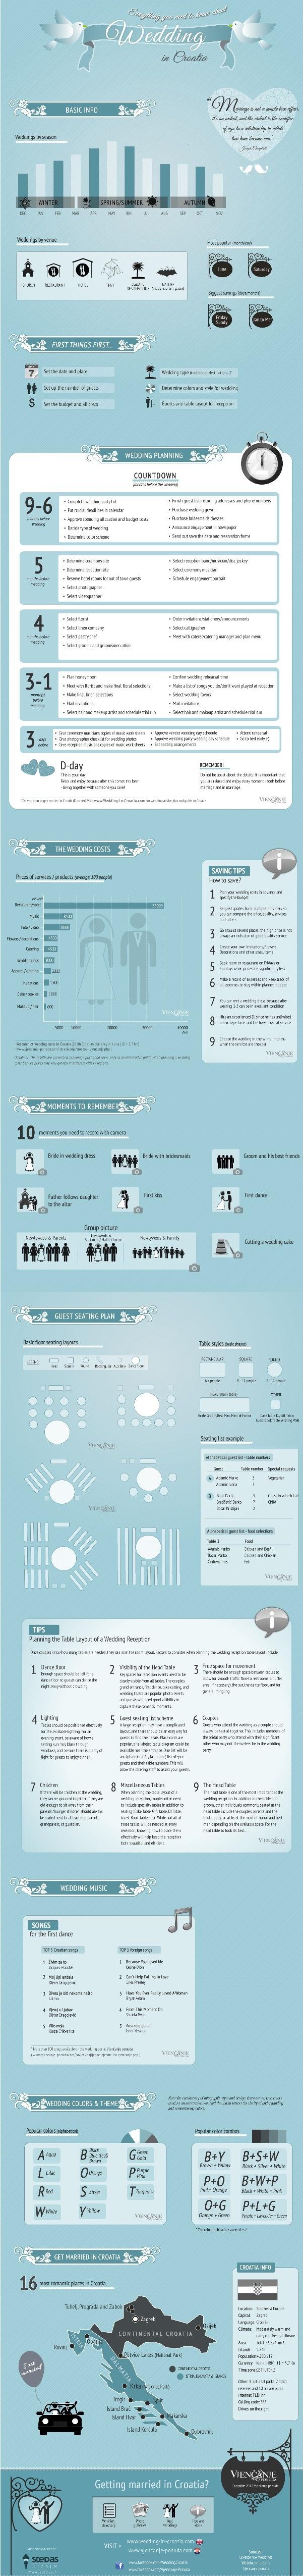 Badezimmerdesign 8 x 6  best my style images on pinterest  bathroom bathroom ideas and